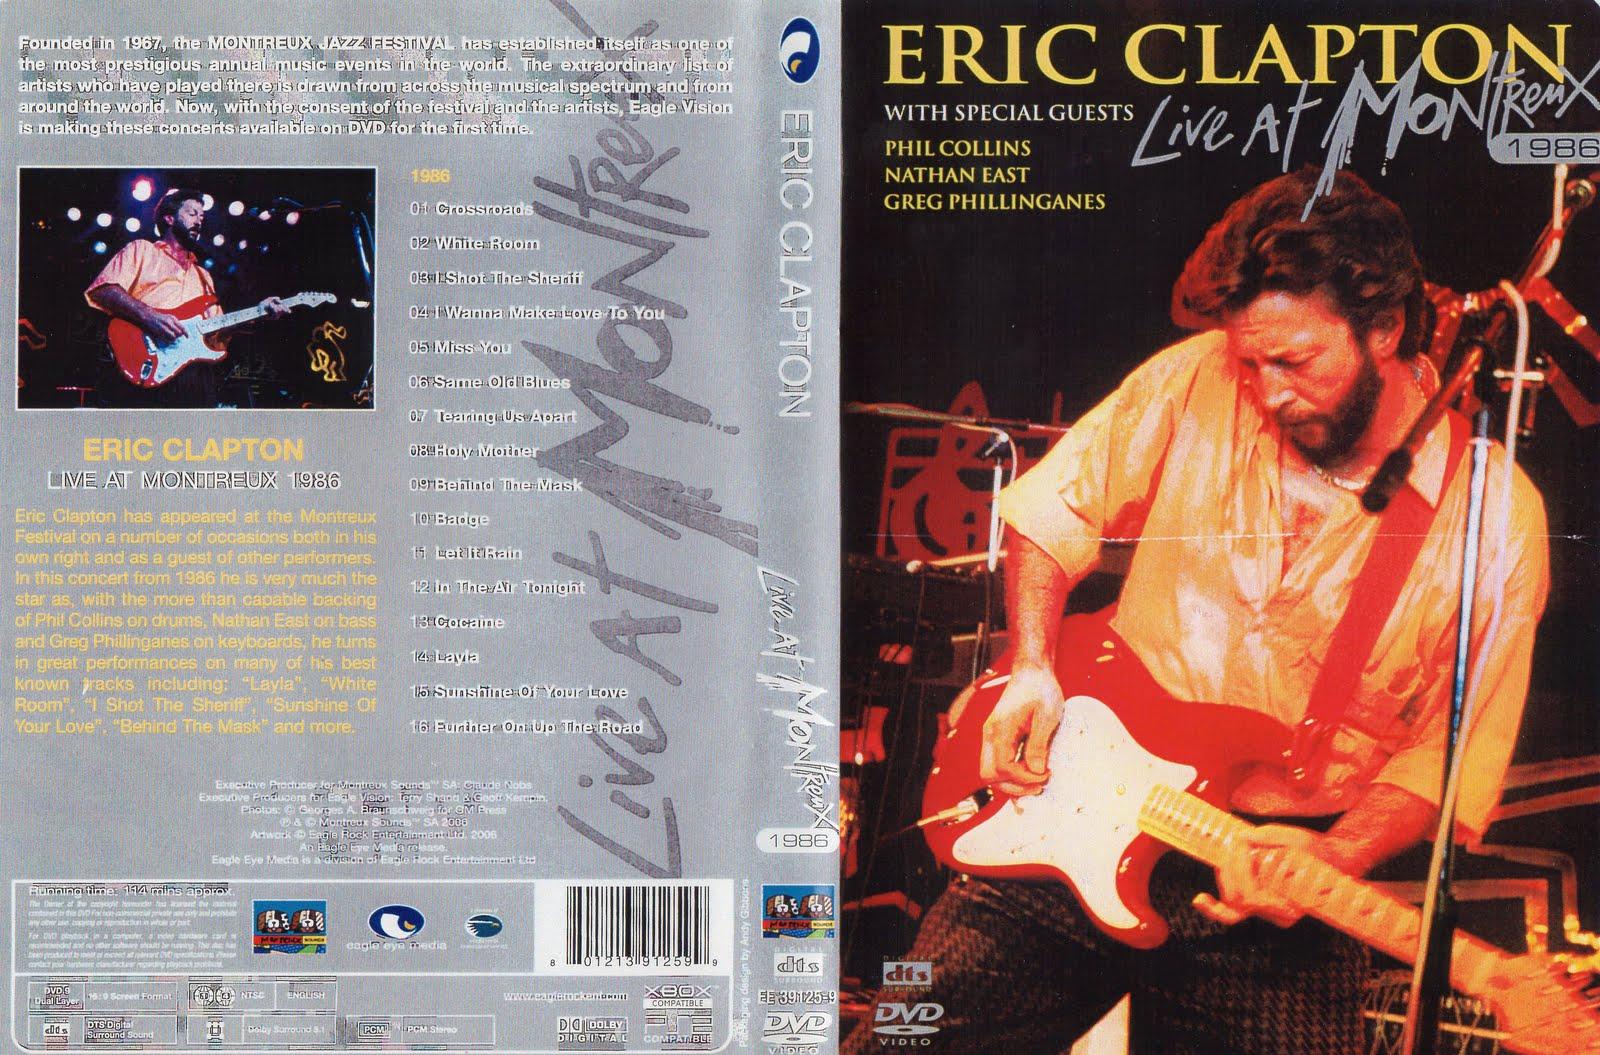 http://4.bp.blogspot.com/_JEuzmcvaXdA/TJTr6QUA2VI/AAAAAAAAAuQ/8_E6gjSaKLU/s1600/Eric+Clapton,Montreux.jpg